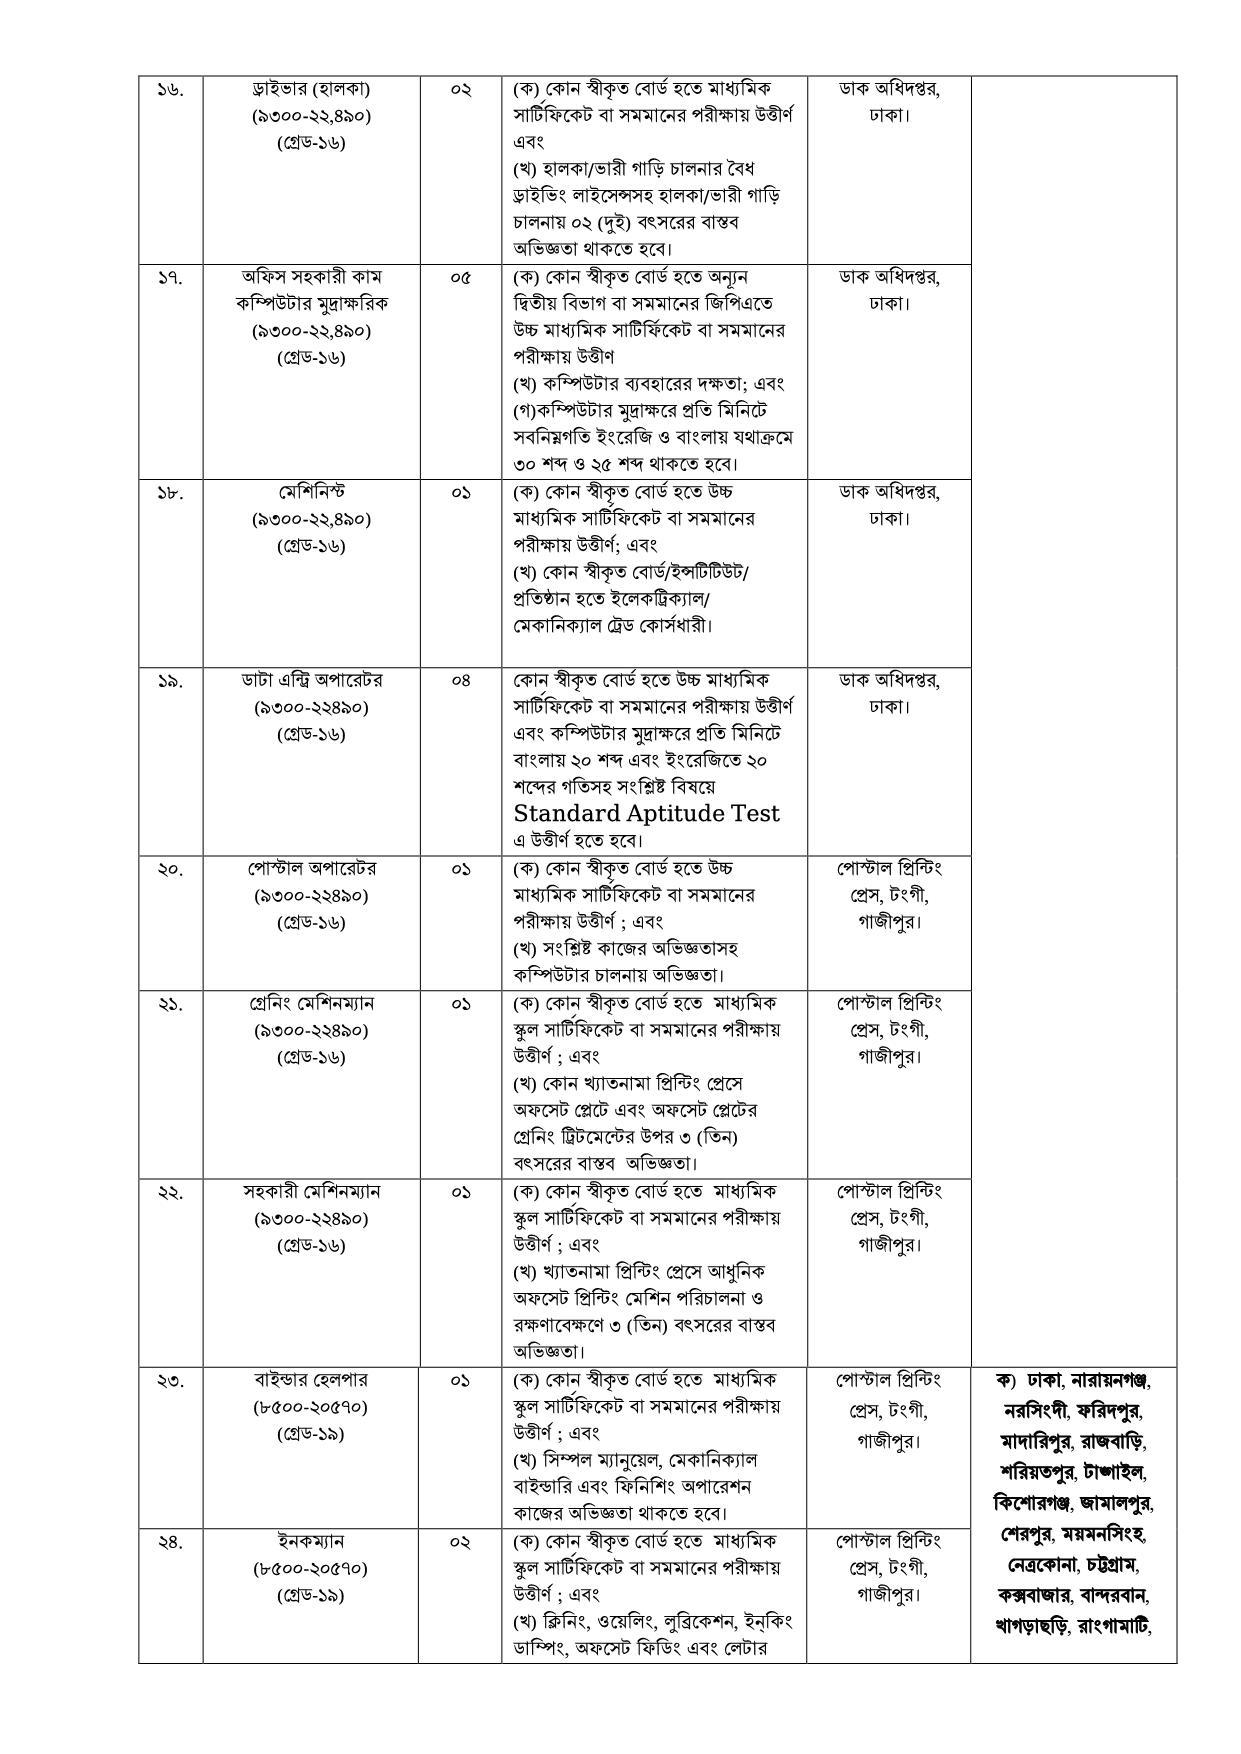 bdpost.gov.bd-Bangladesh Postal Department job circular 2021, বাংলাদশ ডাক বিভাগ নিয়োগ ২০২১ ি https://www.banglanewsexpress.com/